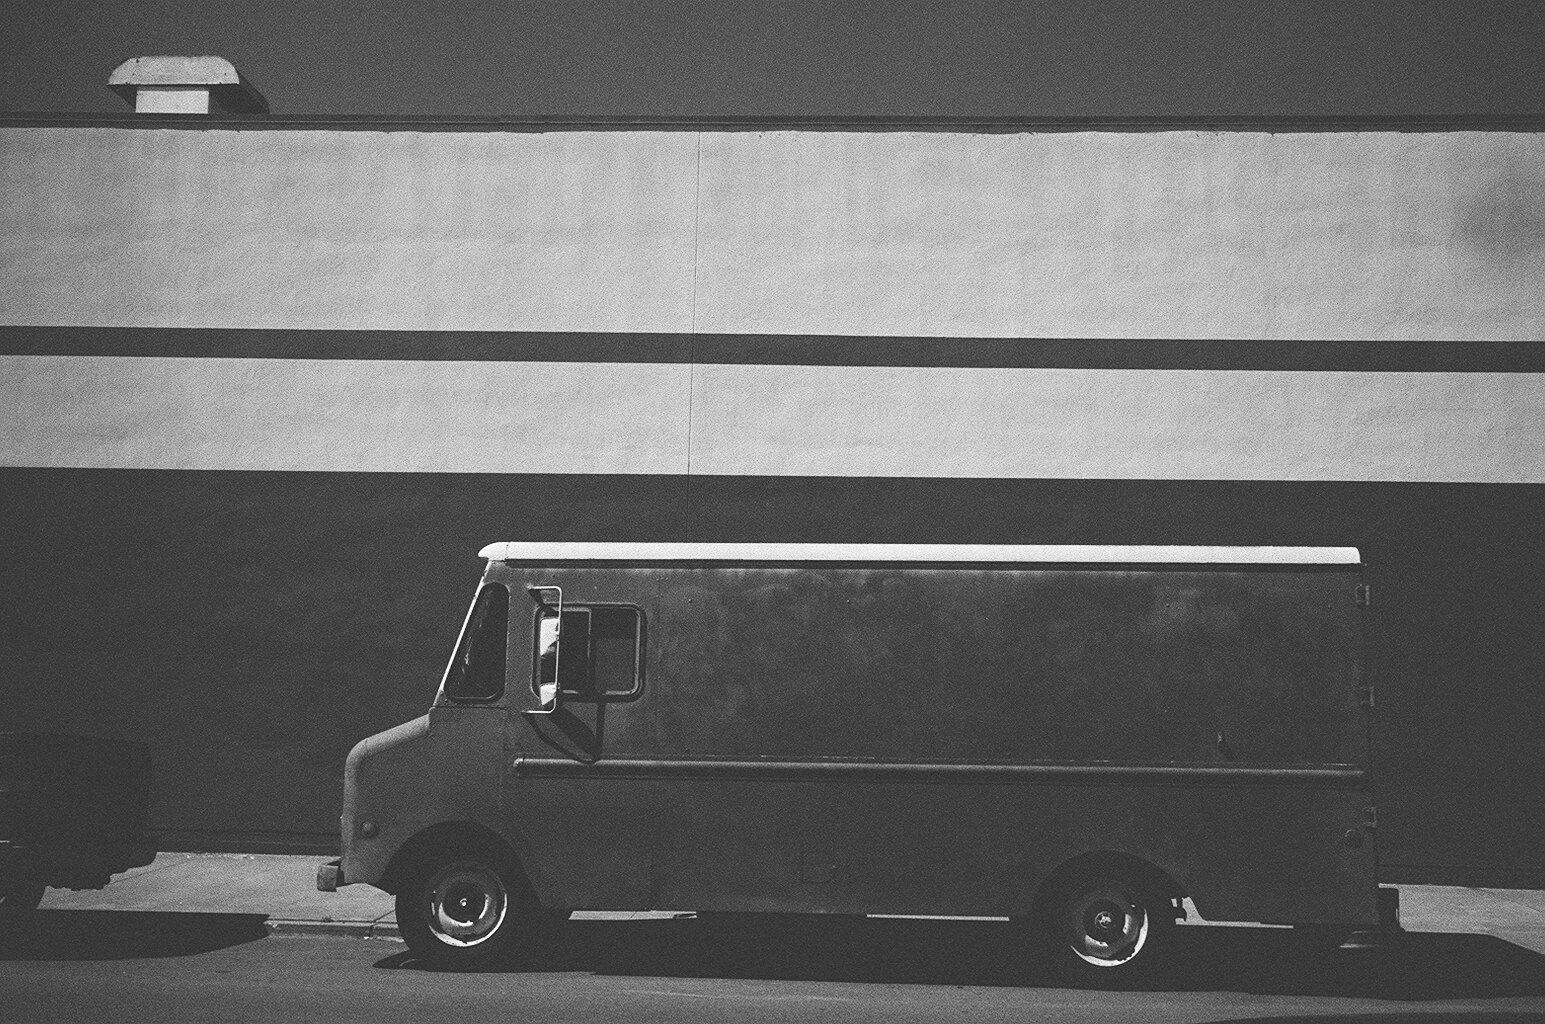 Eric kim black and white film photography Trix 1600 2015 Europe -014.jpg